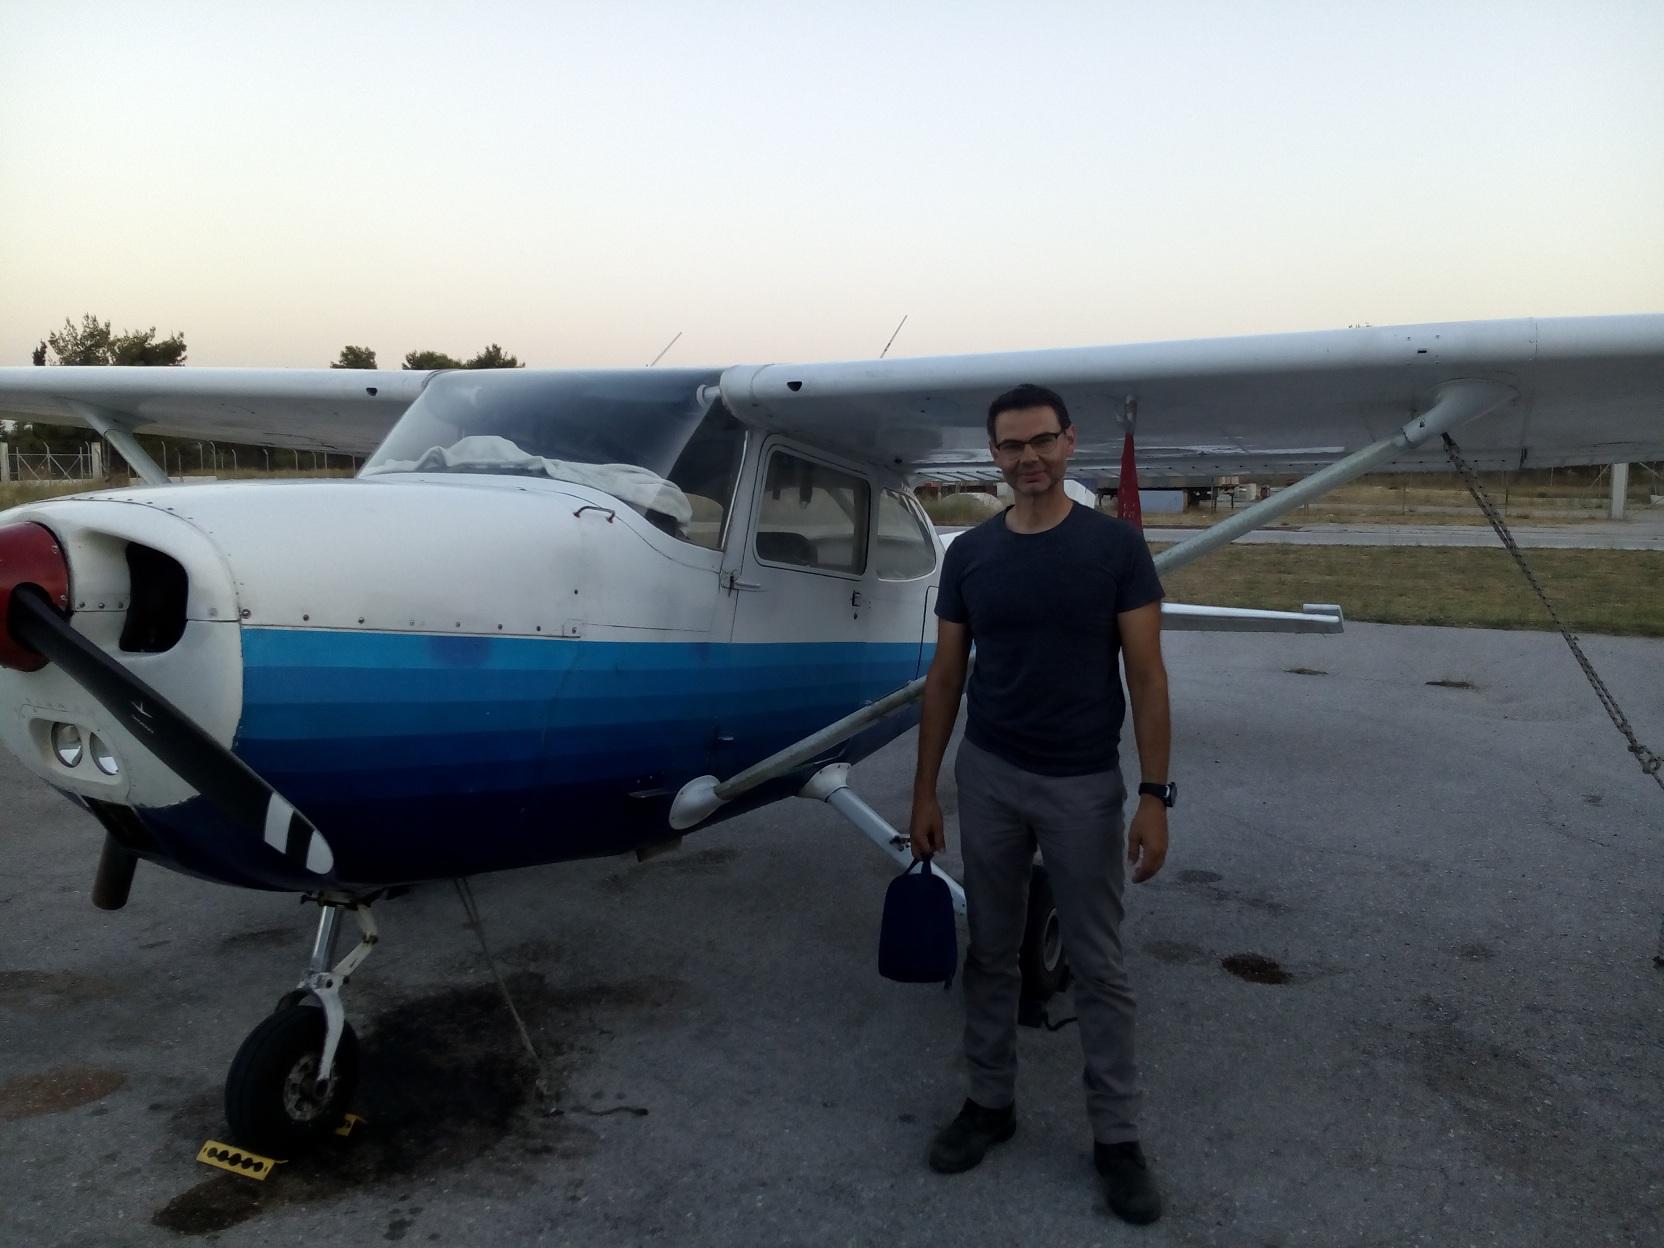 AEROCLUB MESOGEION - NEWS - ANNOUNCEMENTS